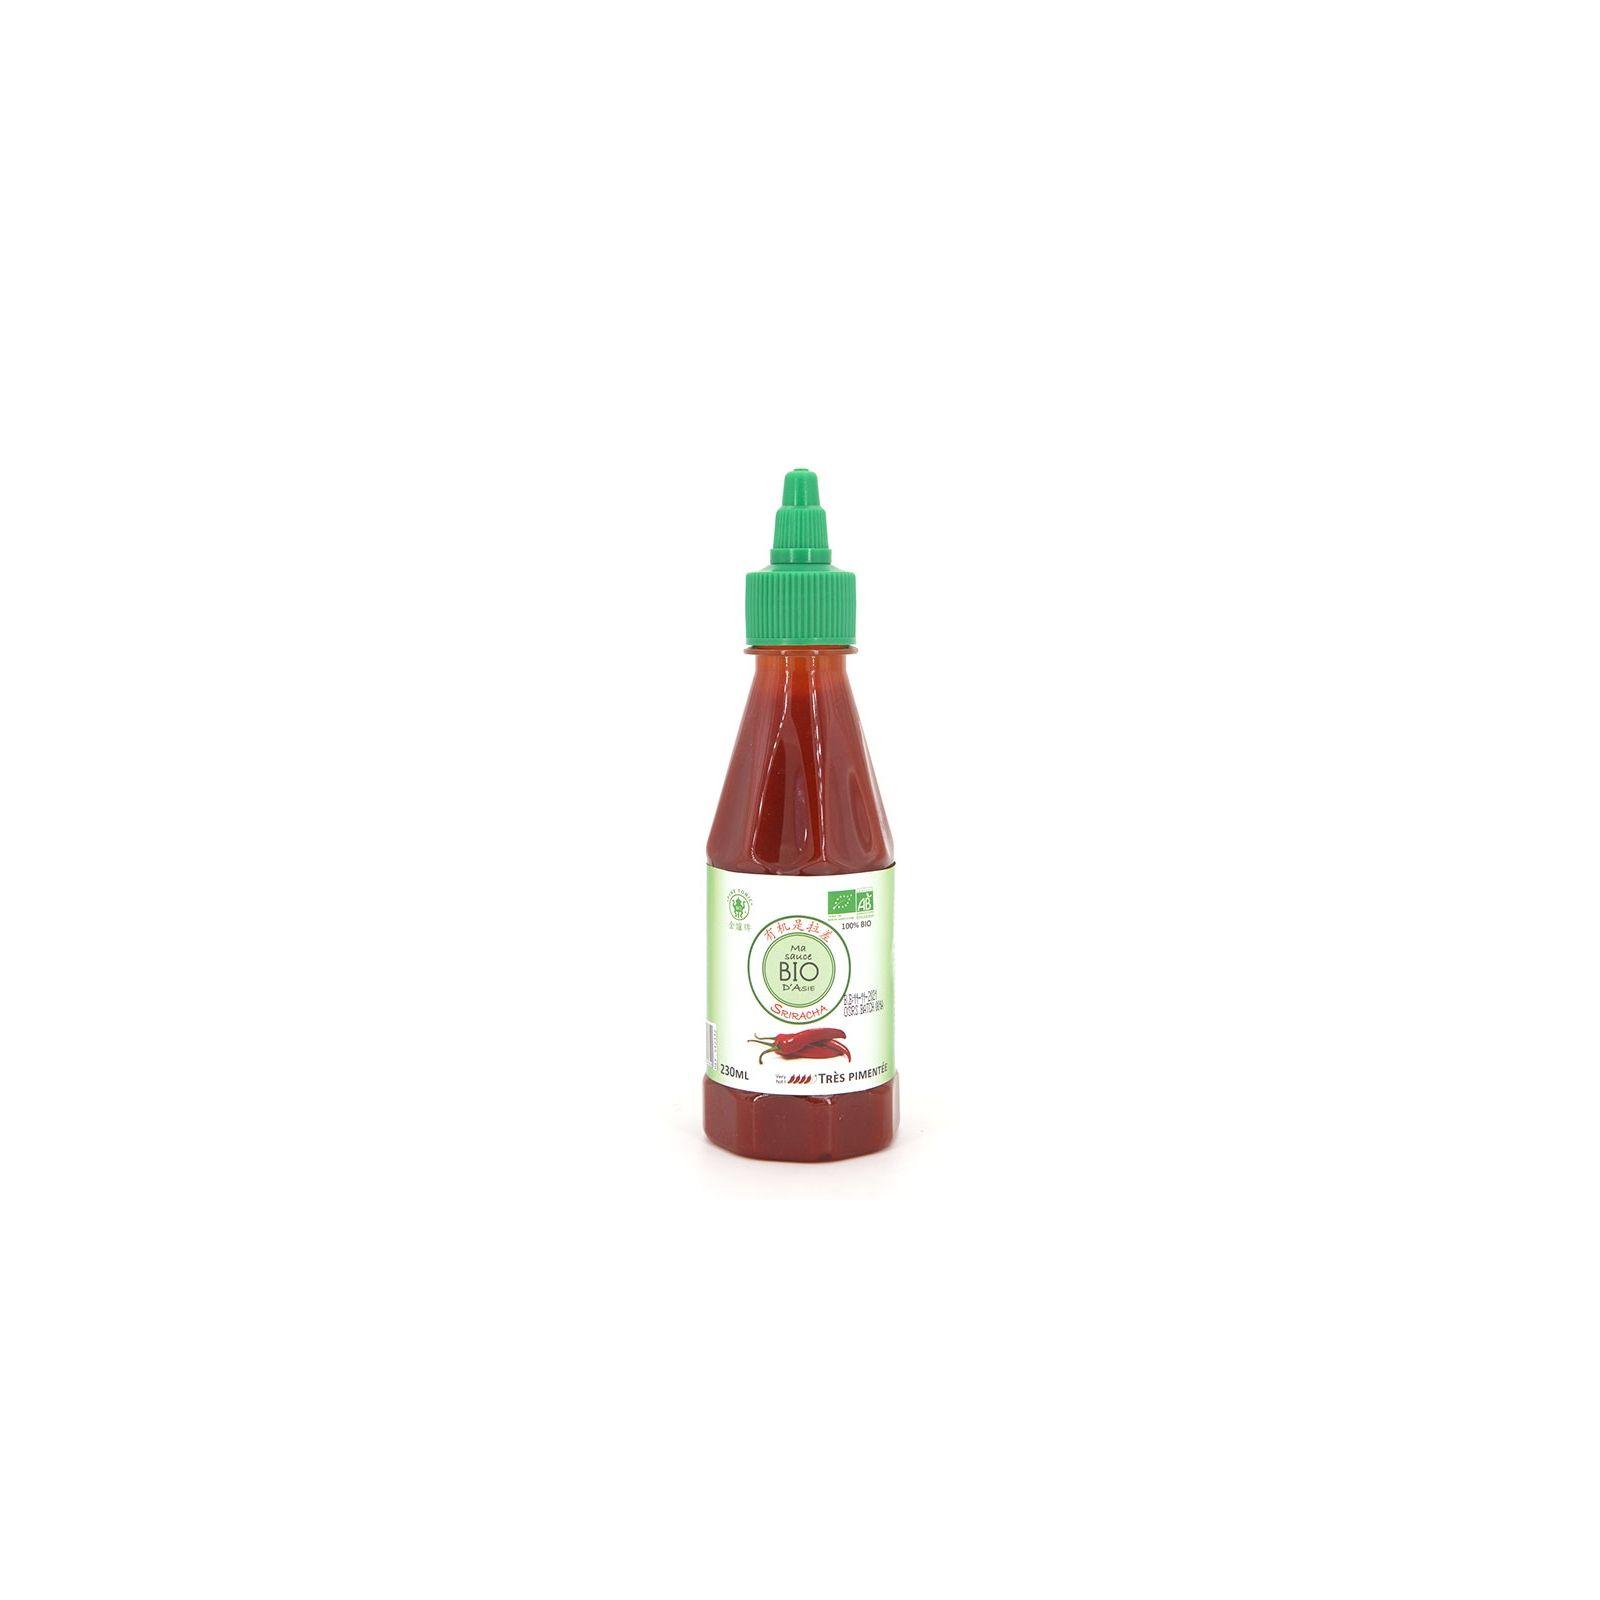 Asia Marché Sauce piments Sriracha BIO 230ml